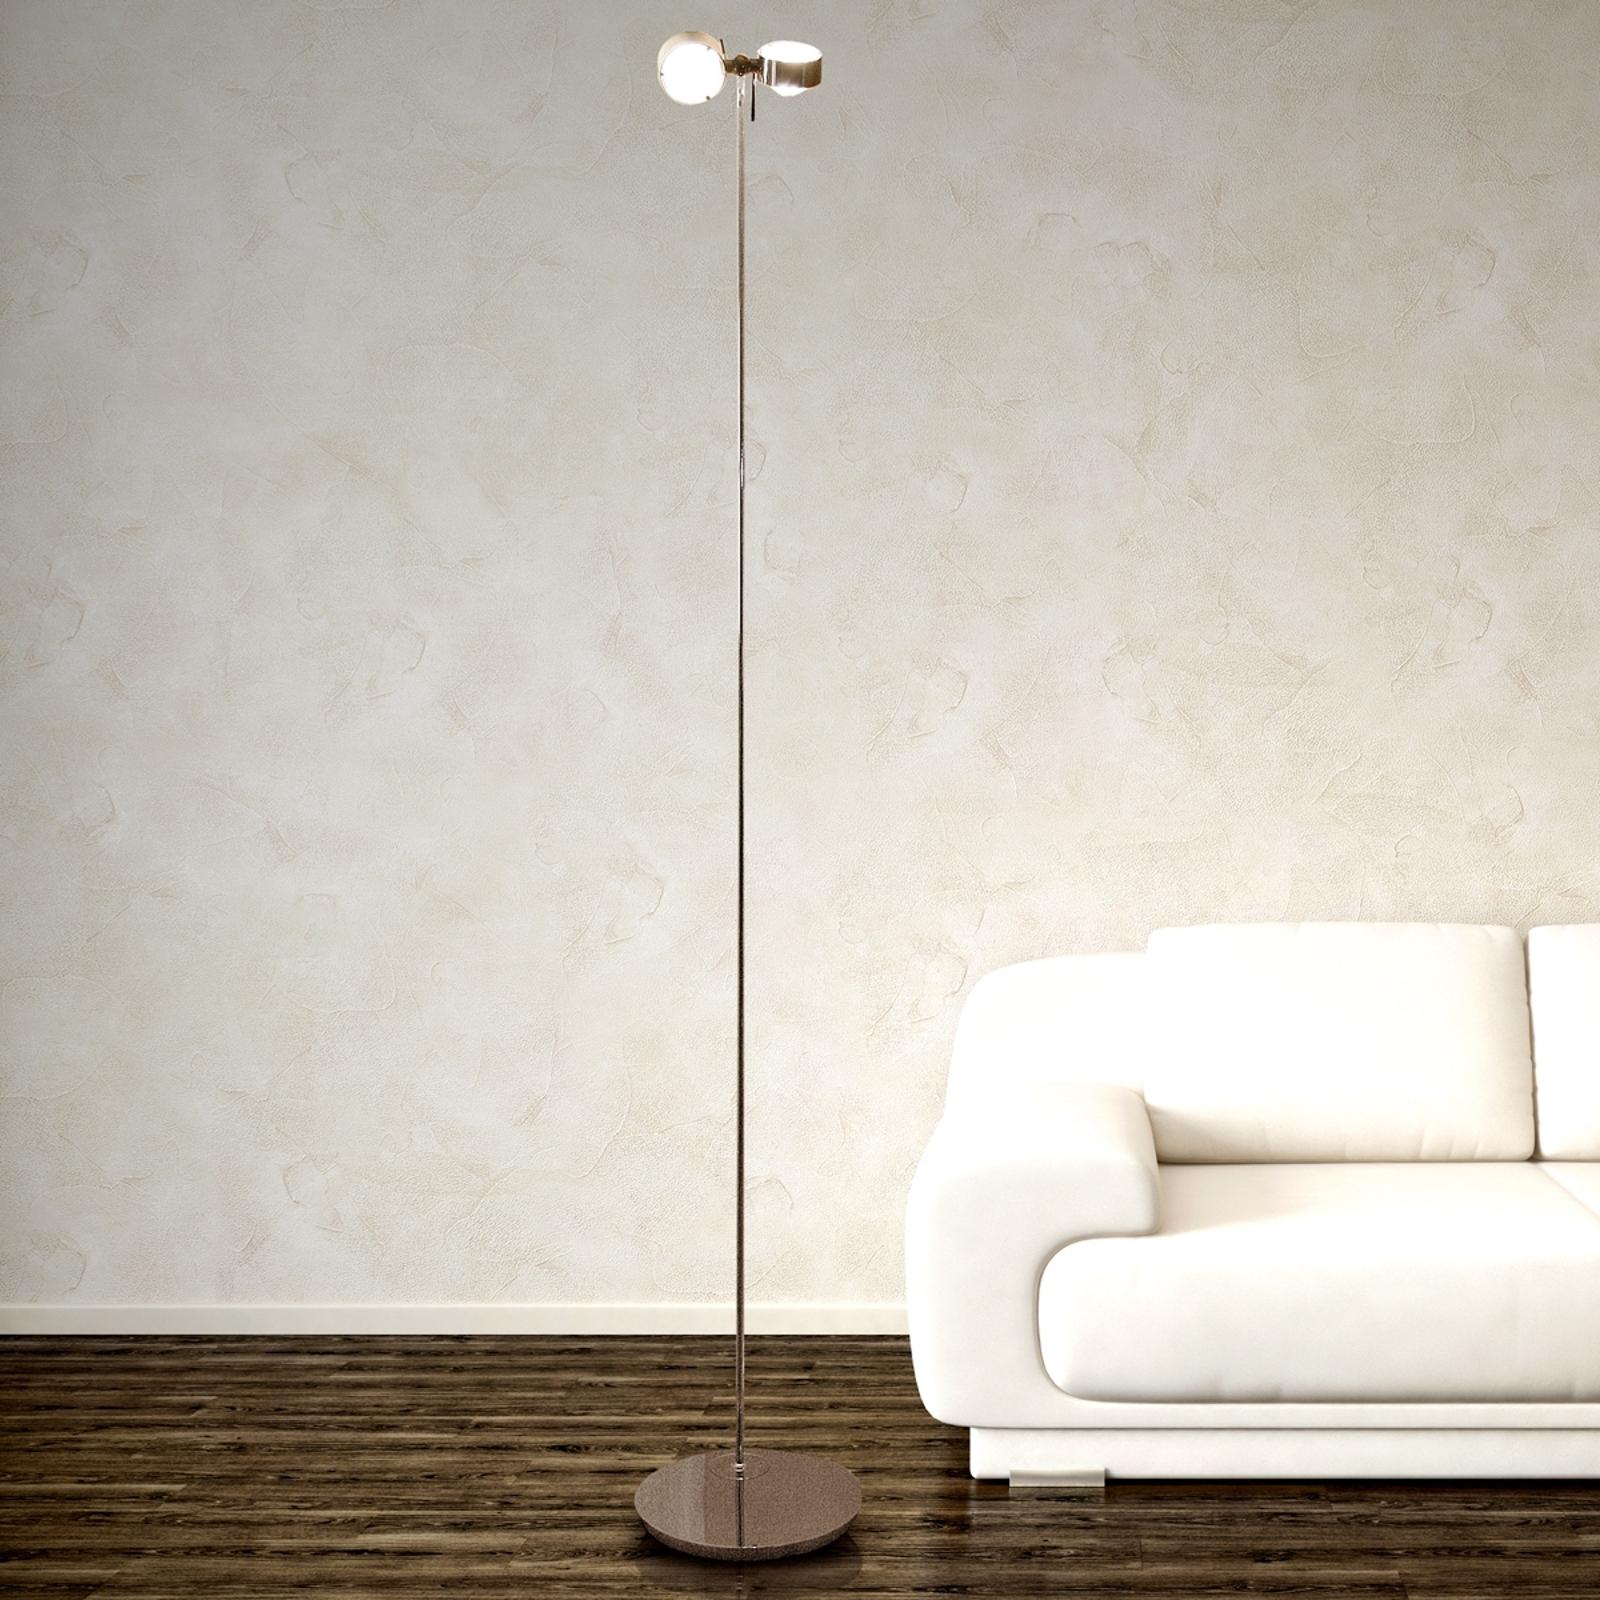 Ruchoma lampa stojąca PUK FLOOR, chrom mat, 2-pkt.